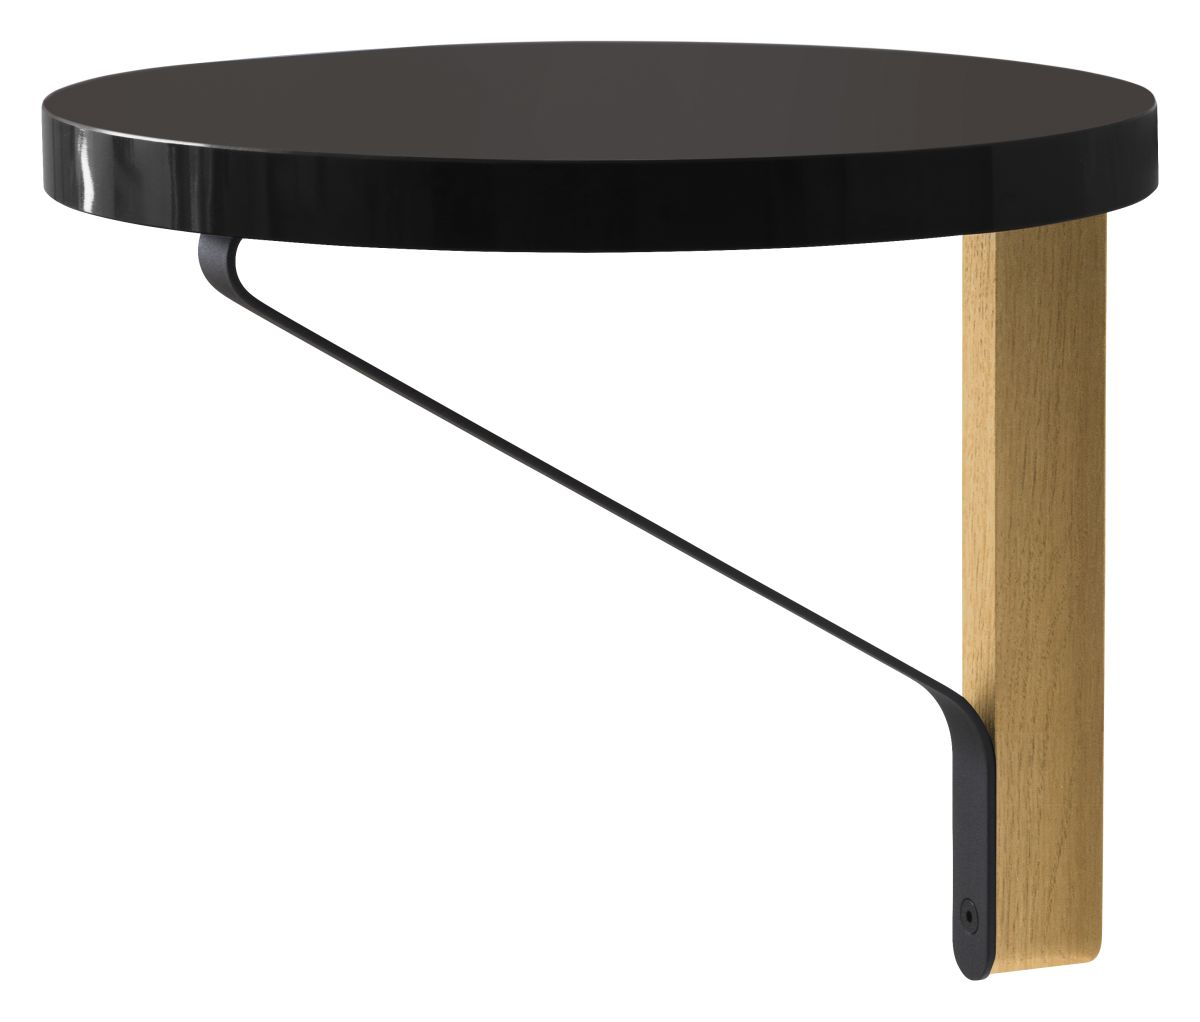 Kaari Wall Shelf round REB007 clear varnish_black linoleum